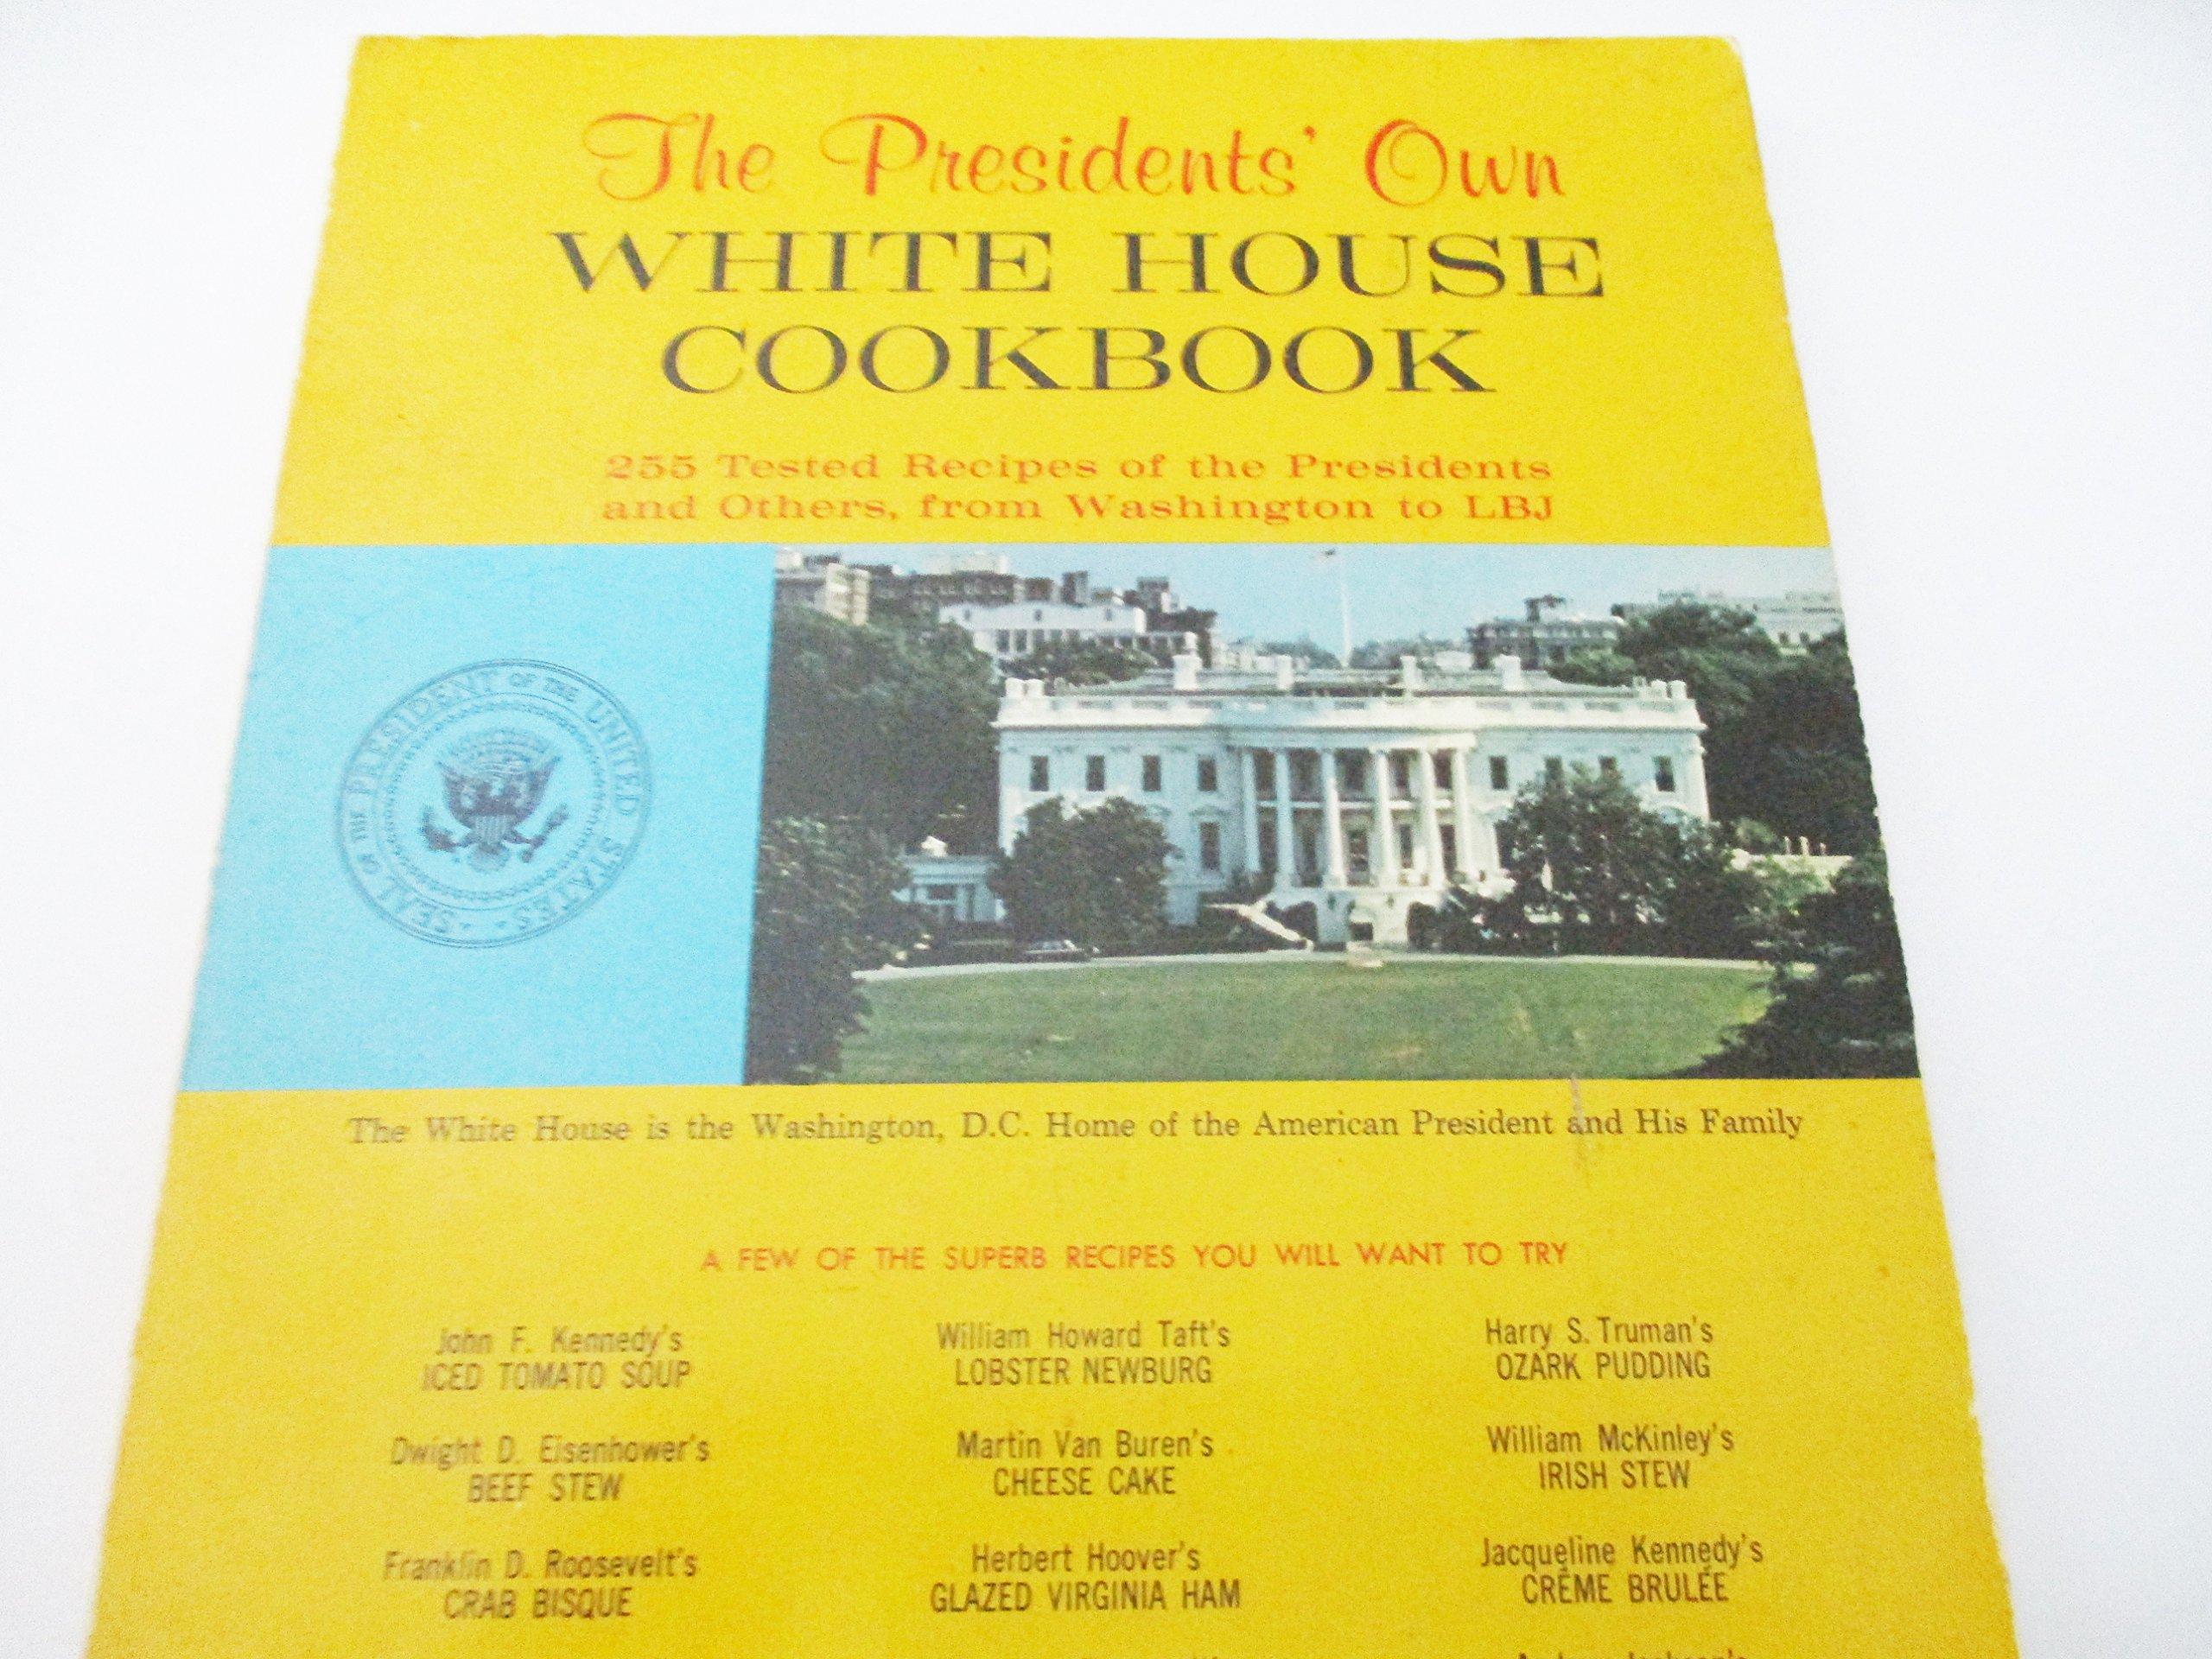 The Presidents' Own White House Cookbook: Robert Jones: 9780832605413:  Amazon.com: Books